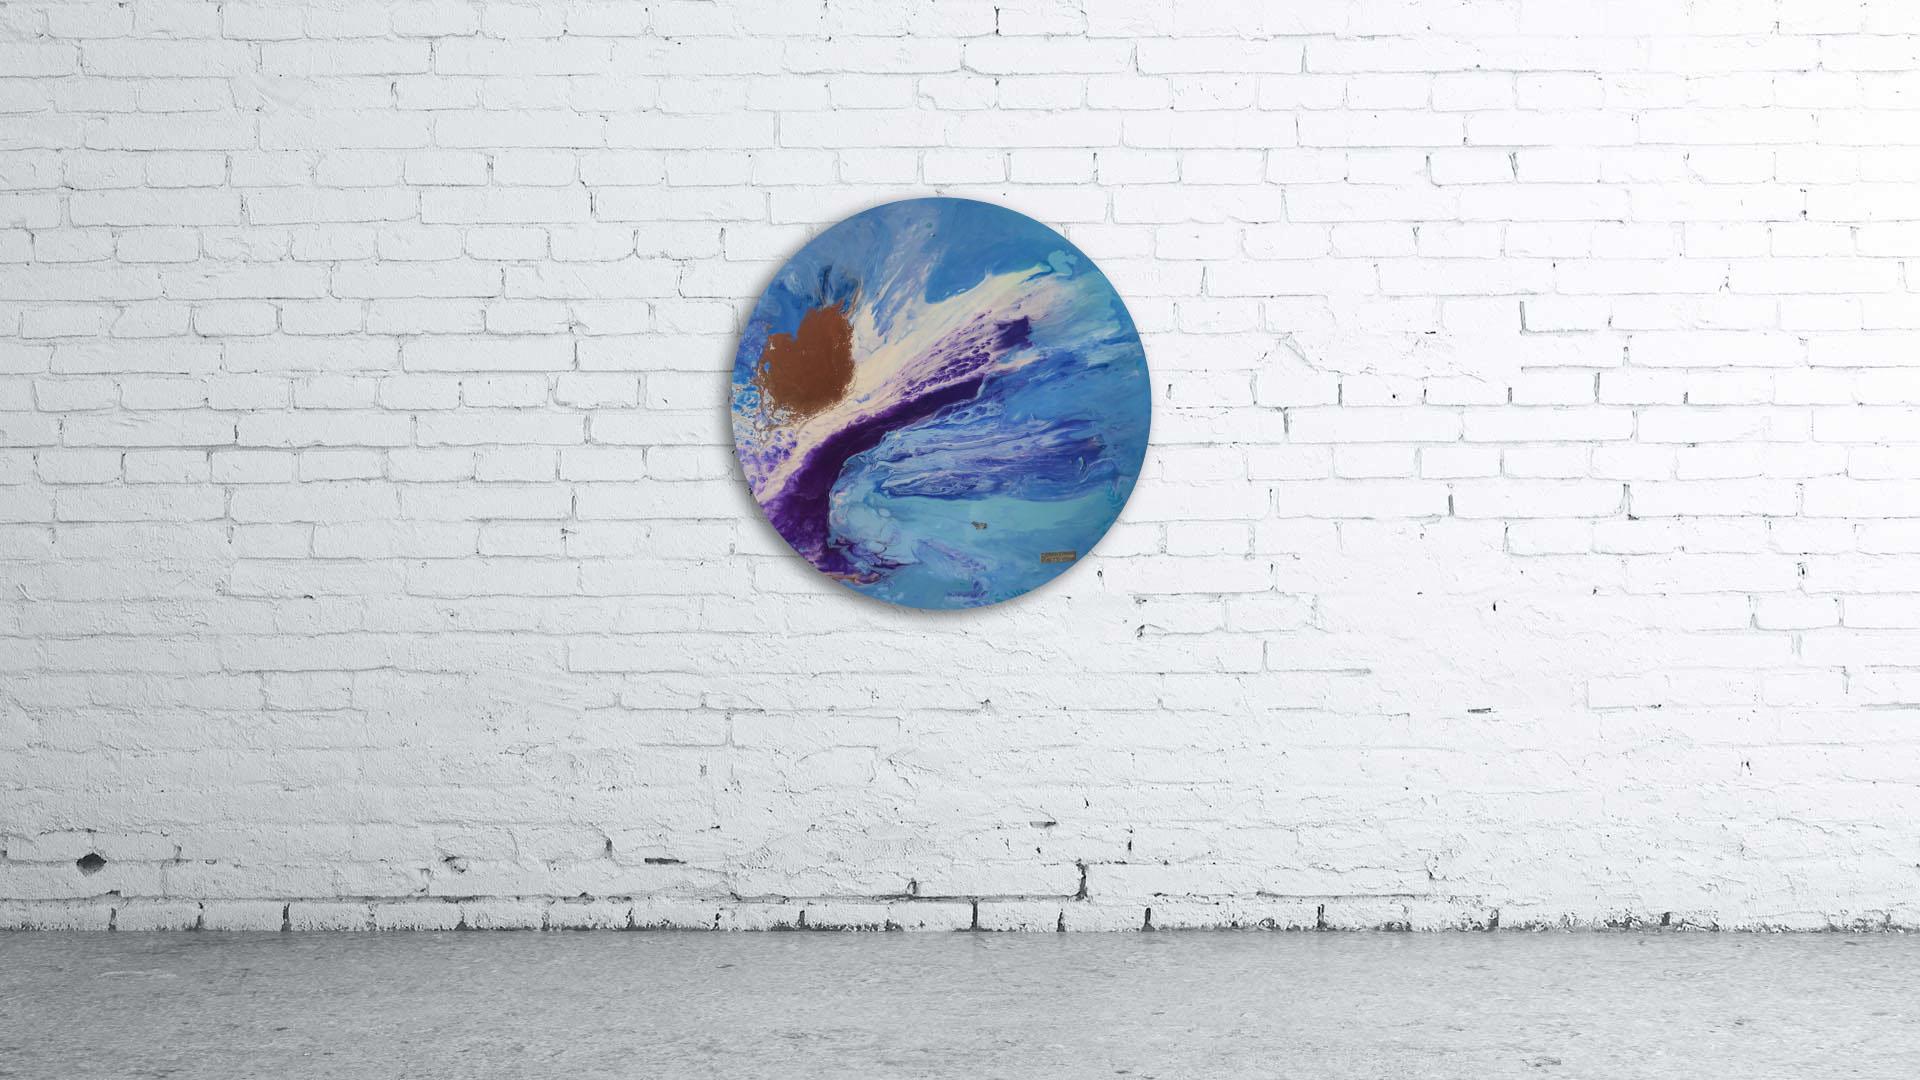 Ocean explosion Image